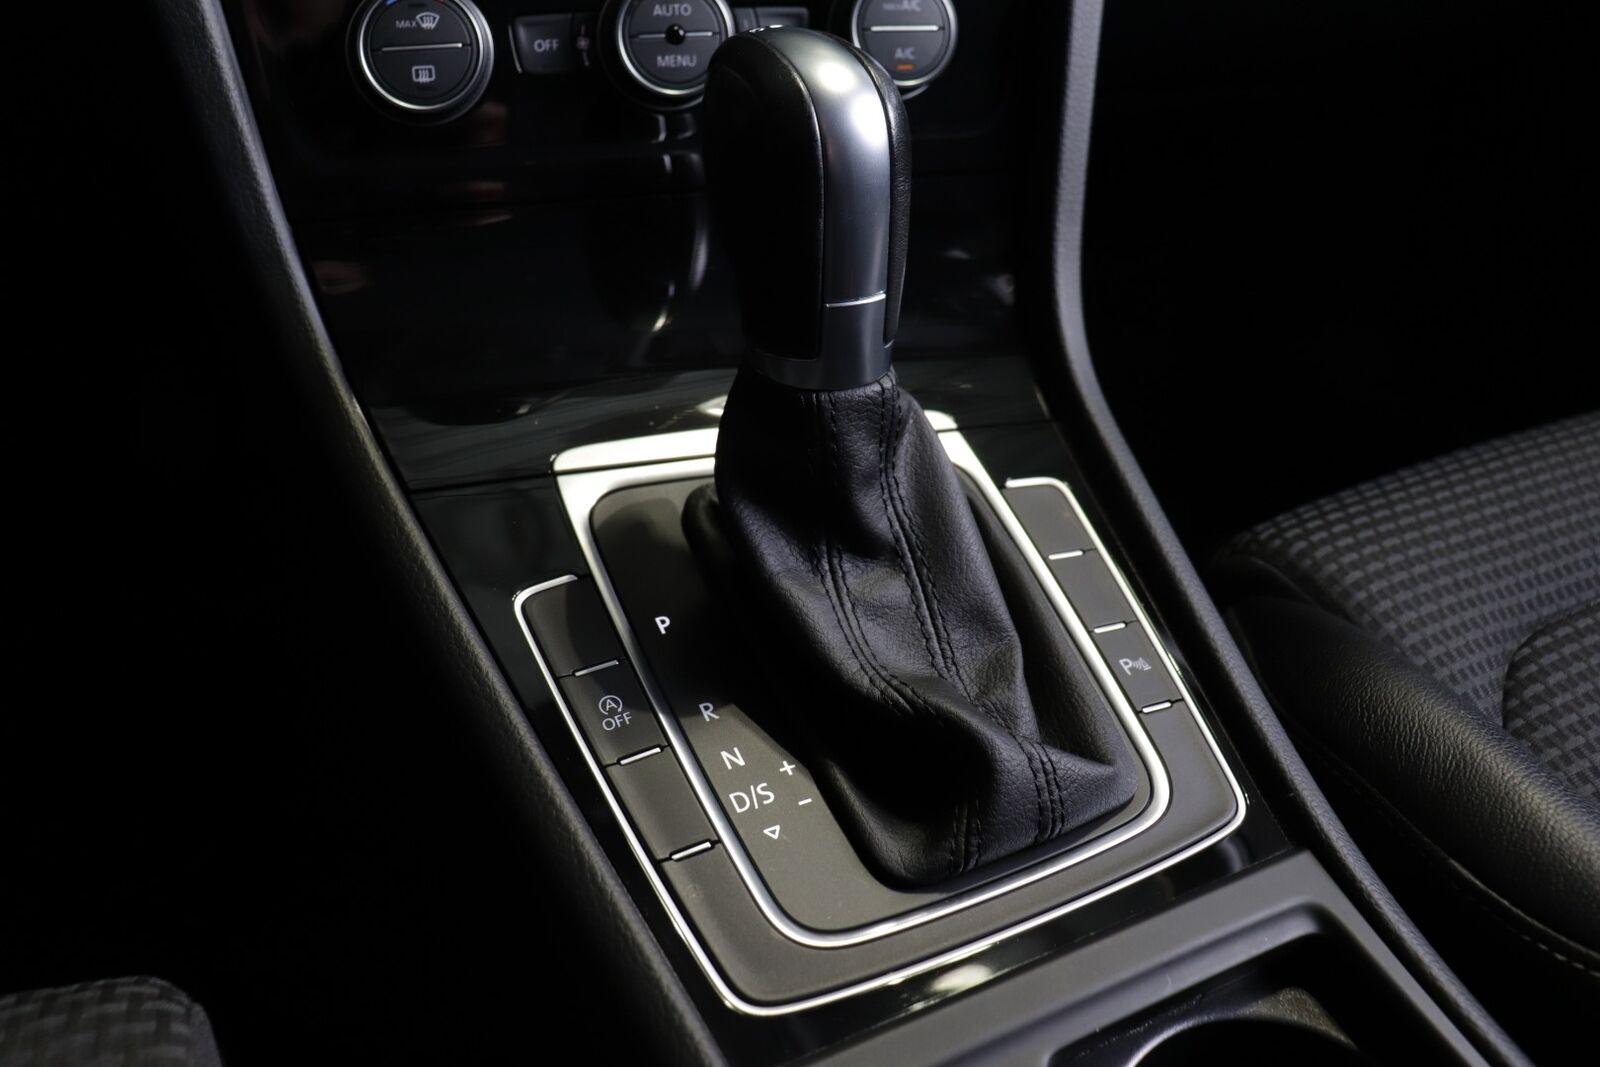 VW Golf VII TDi 150 Highline Variant DSG